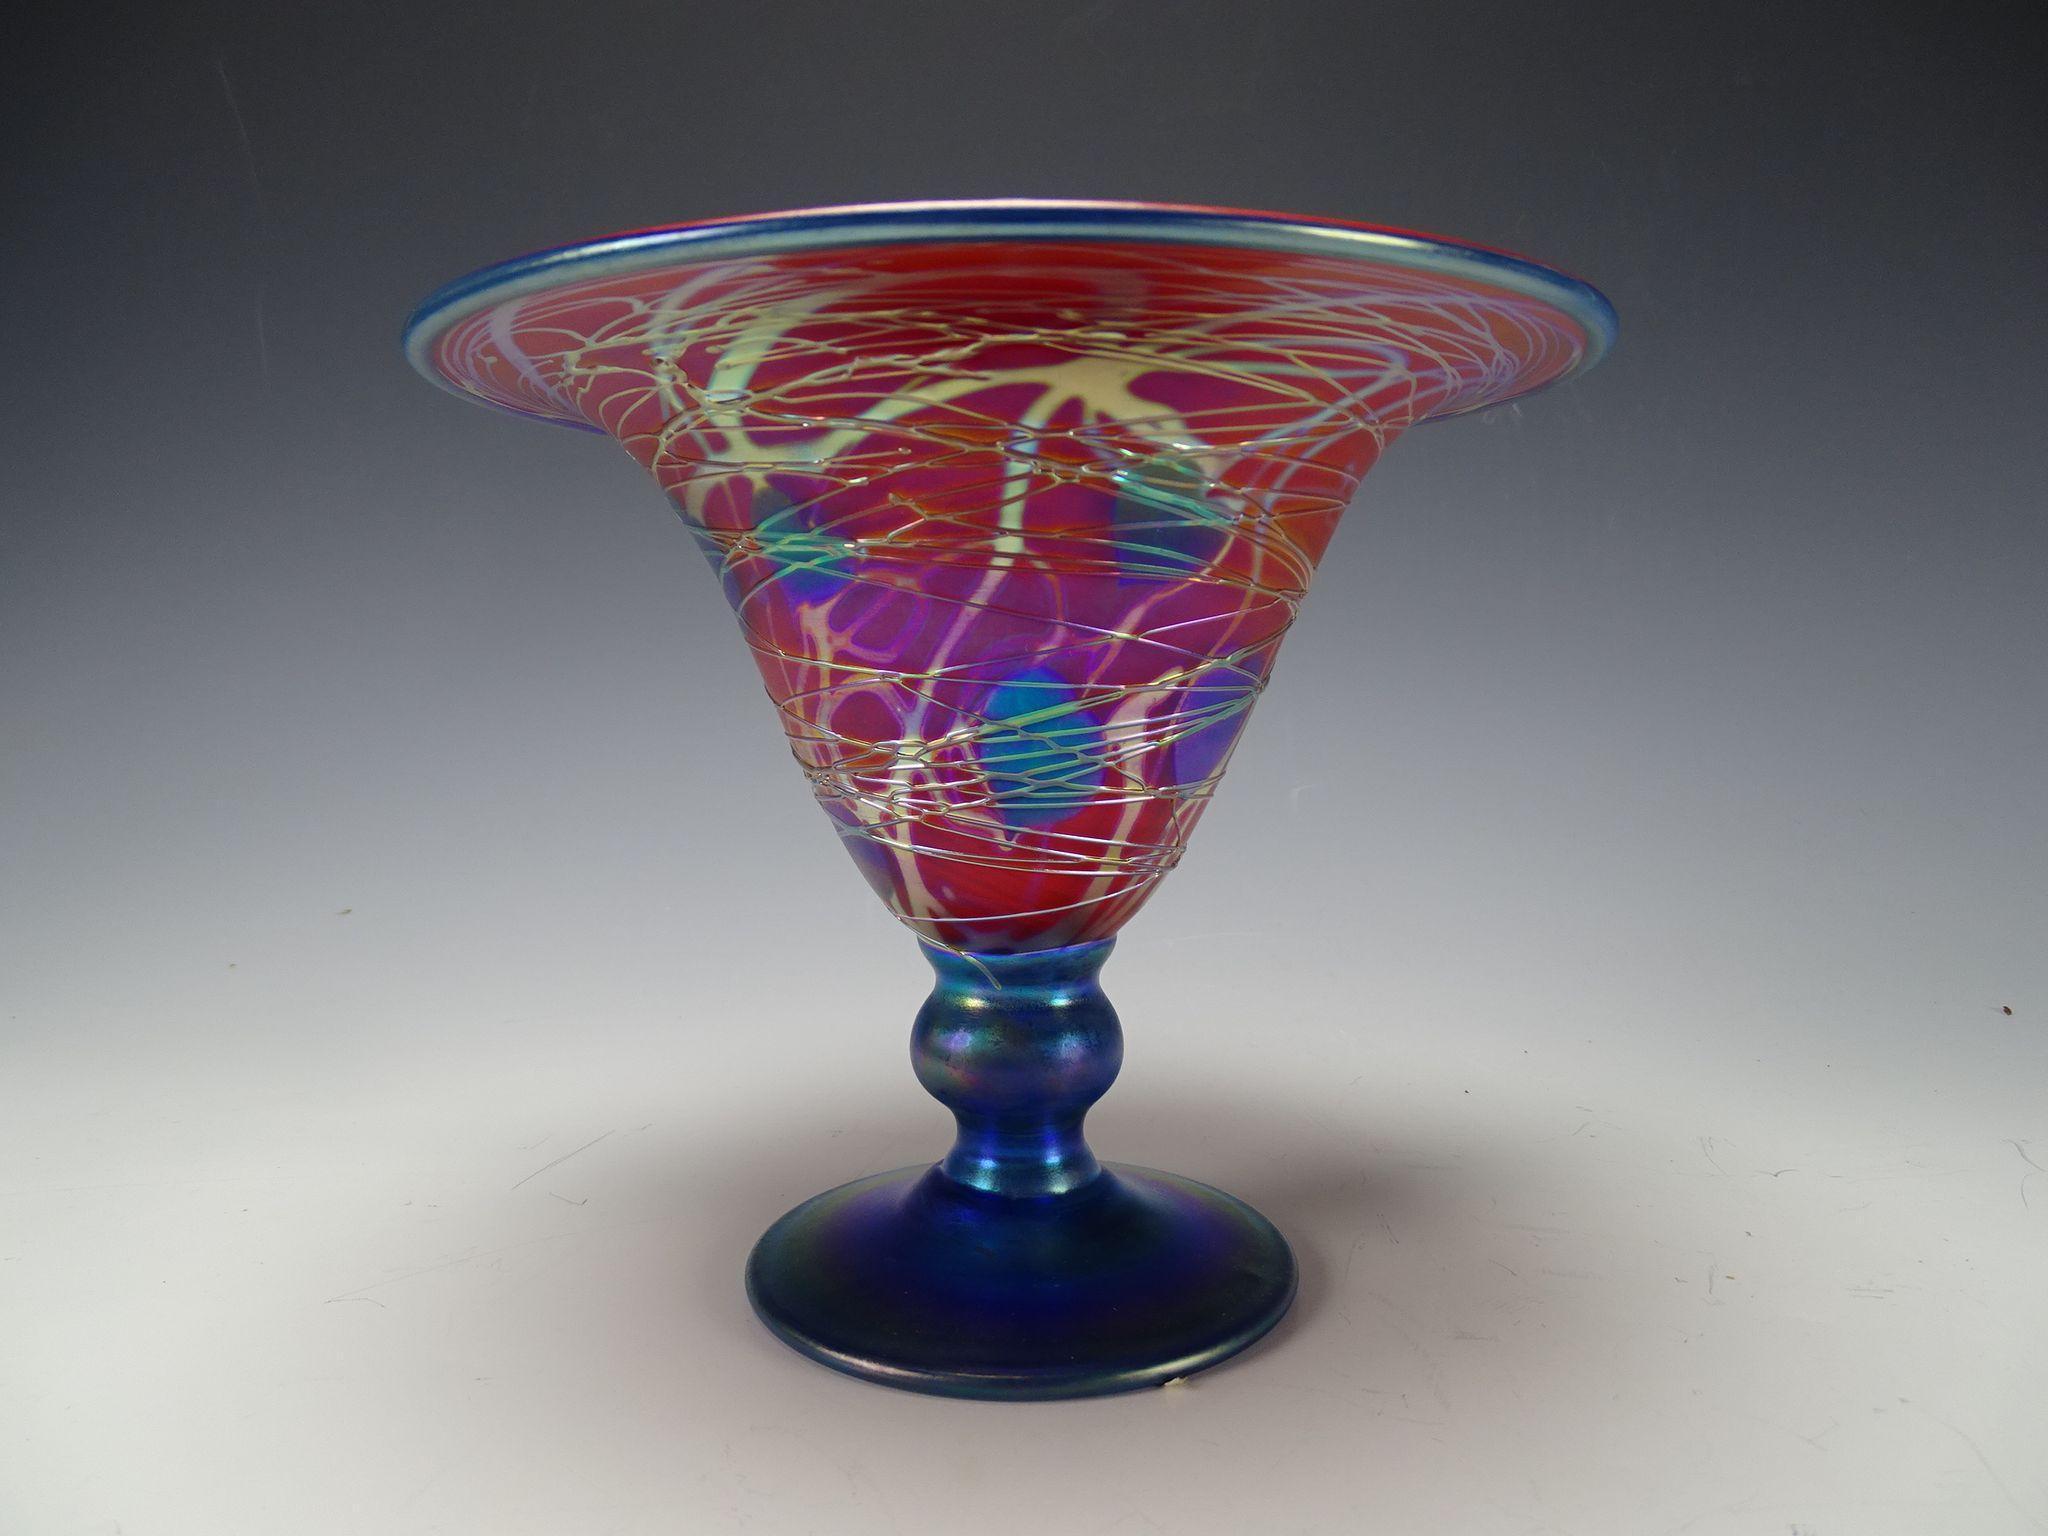 Great Carl Radke Iridescent Heart and Vine Glass Vase